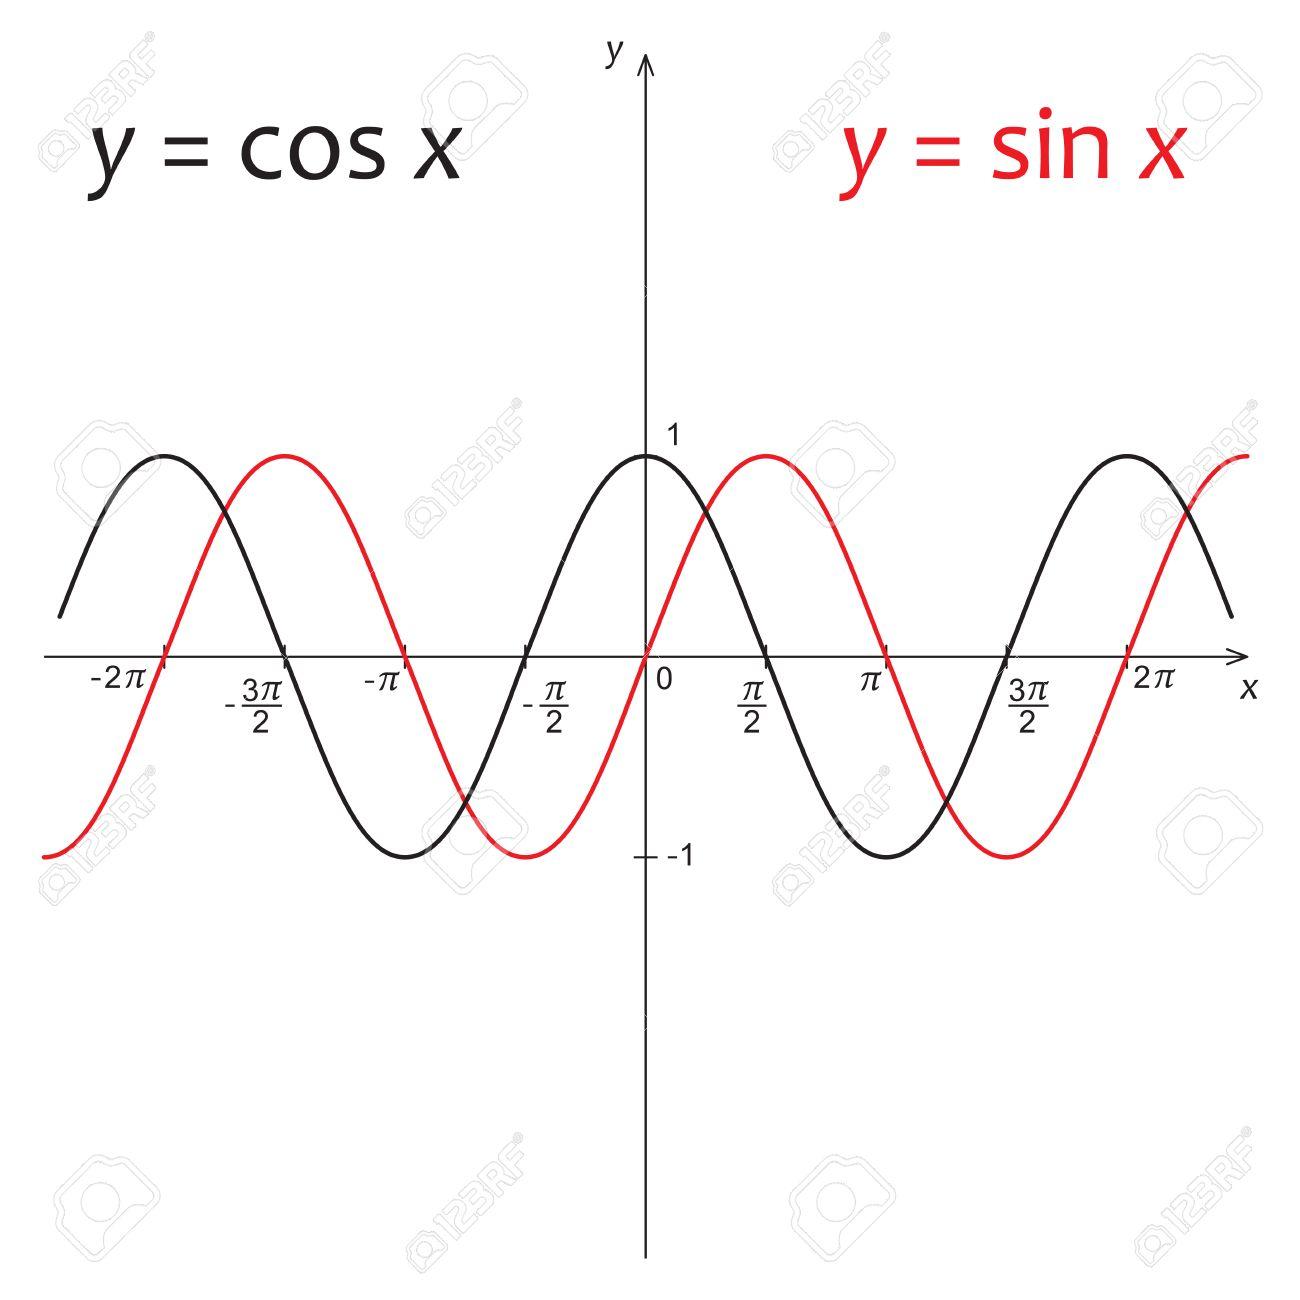 vector illustration of mathematics functions y sin x and y cos